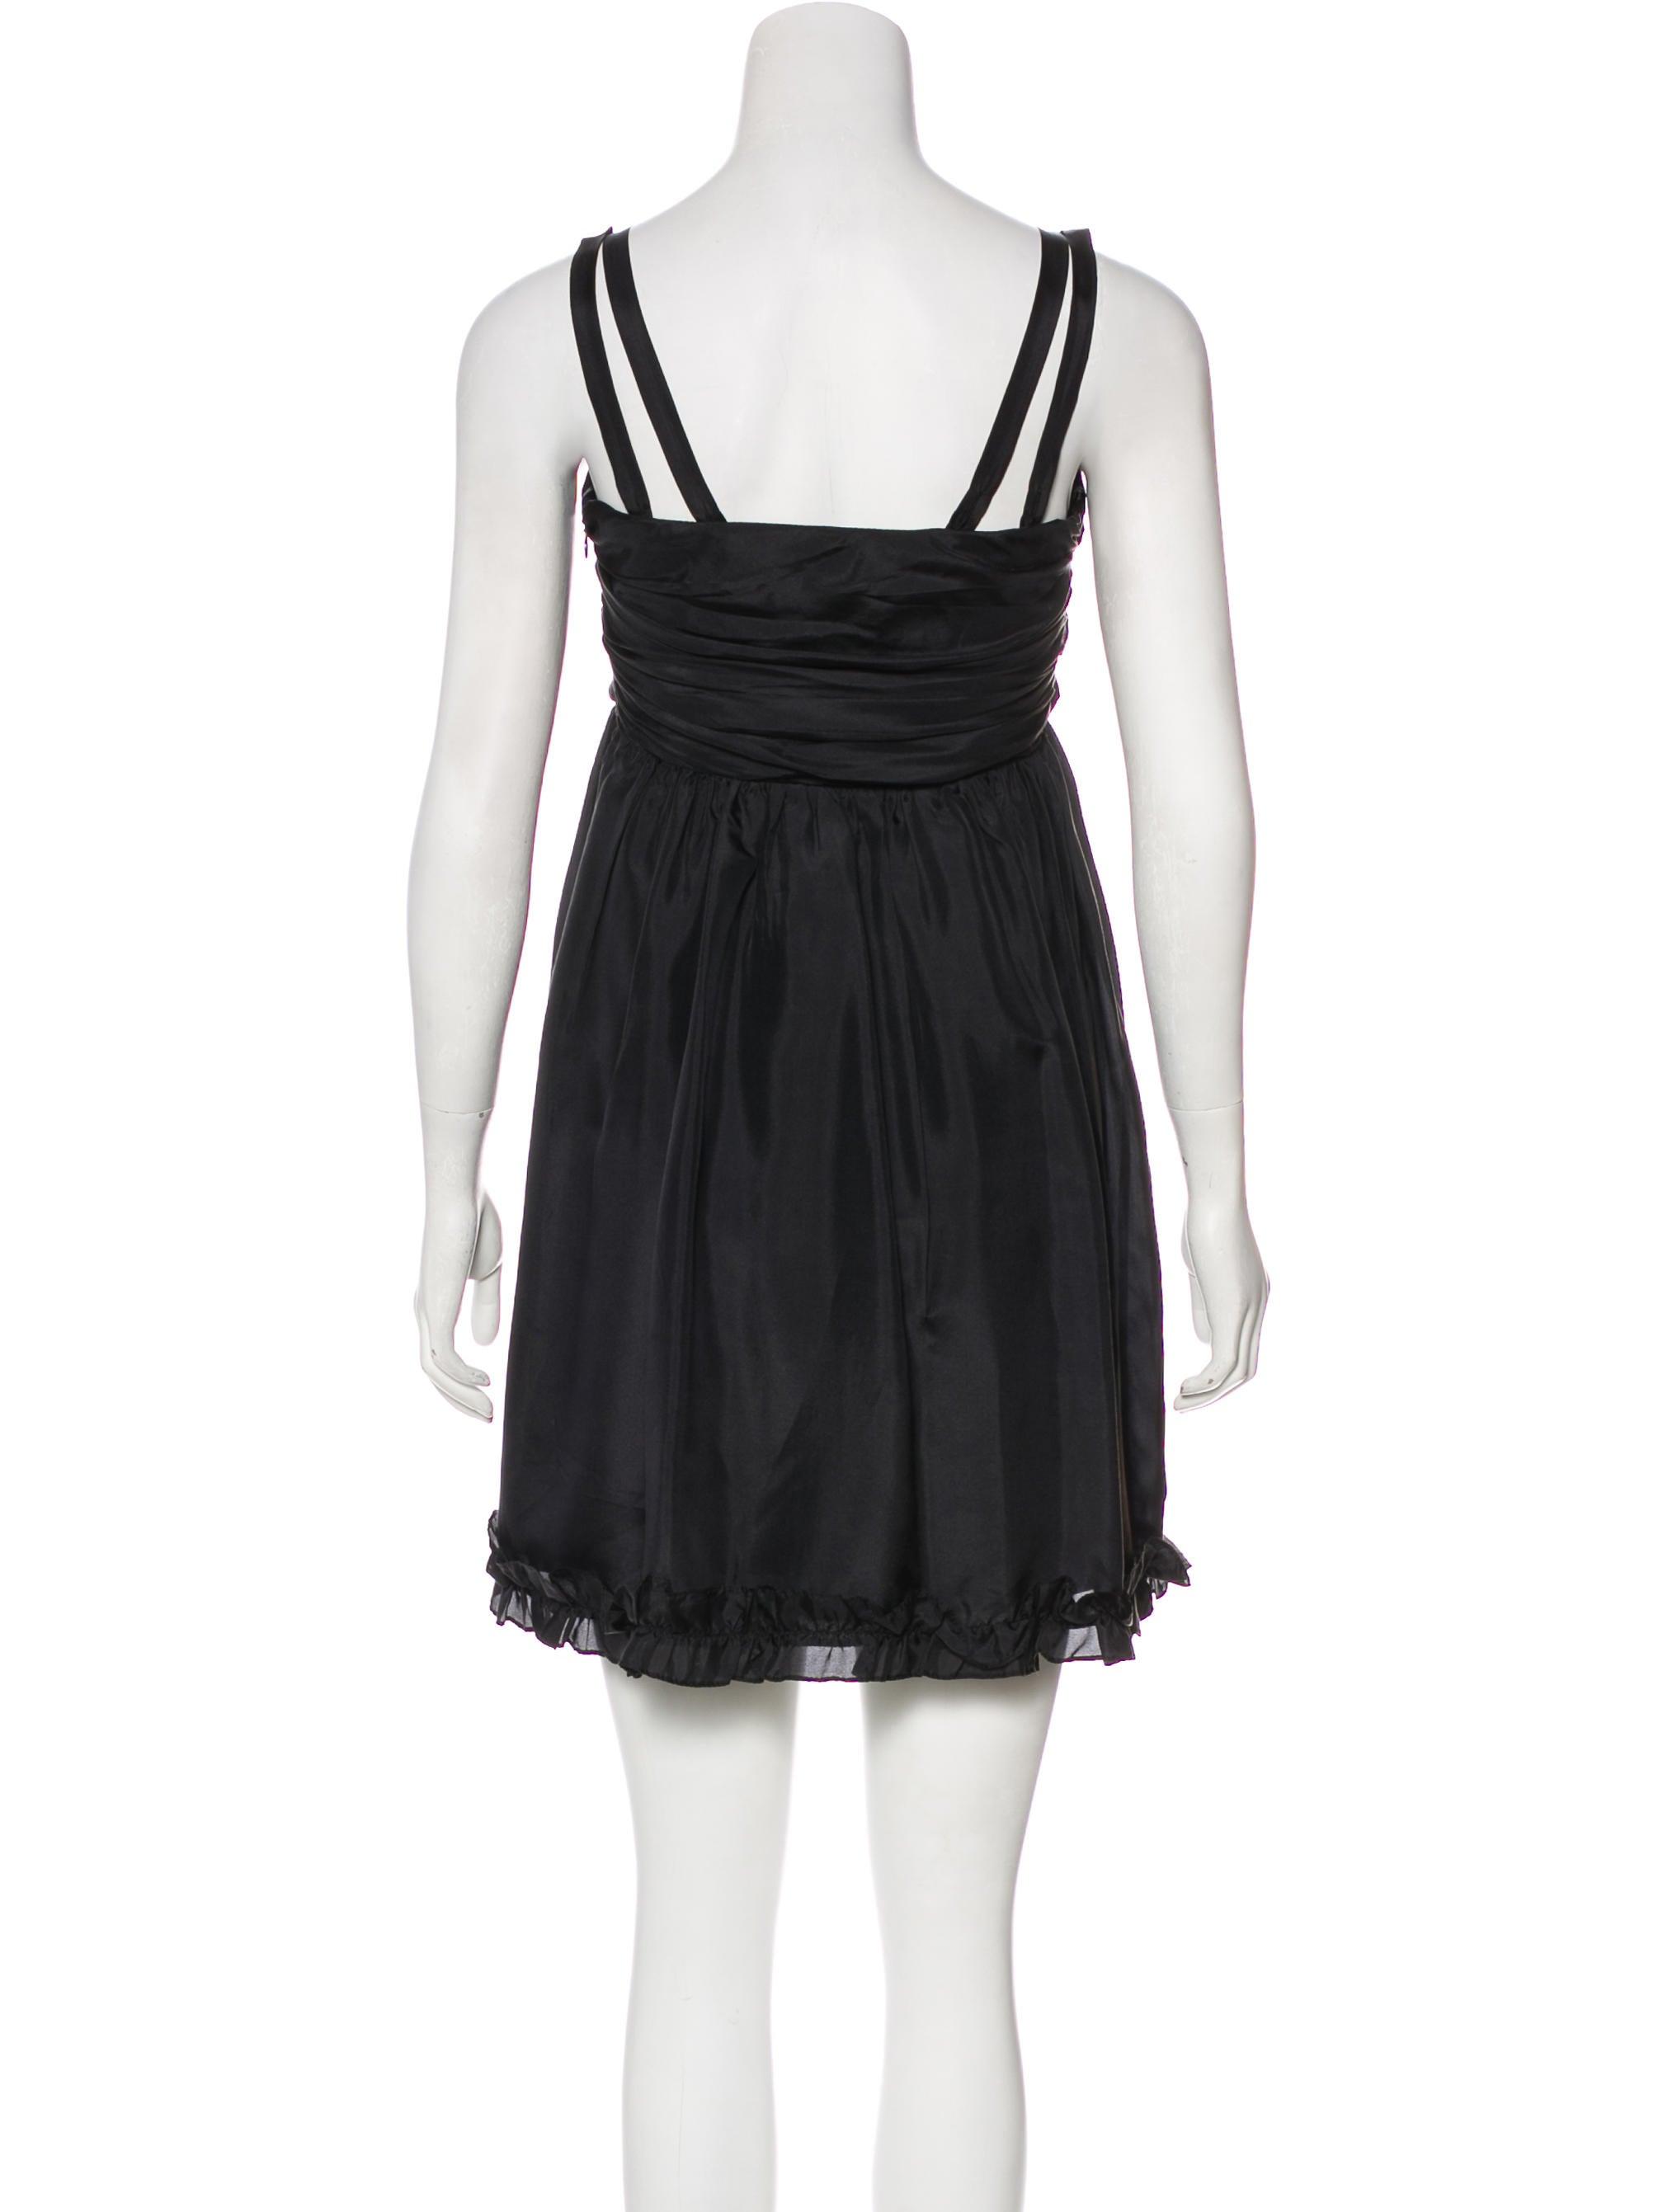 32cd0a06a9 Betsey Johnson Empire Silk Mini Dress - Clothing - WBE20025